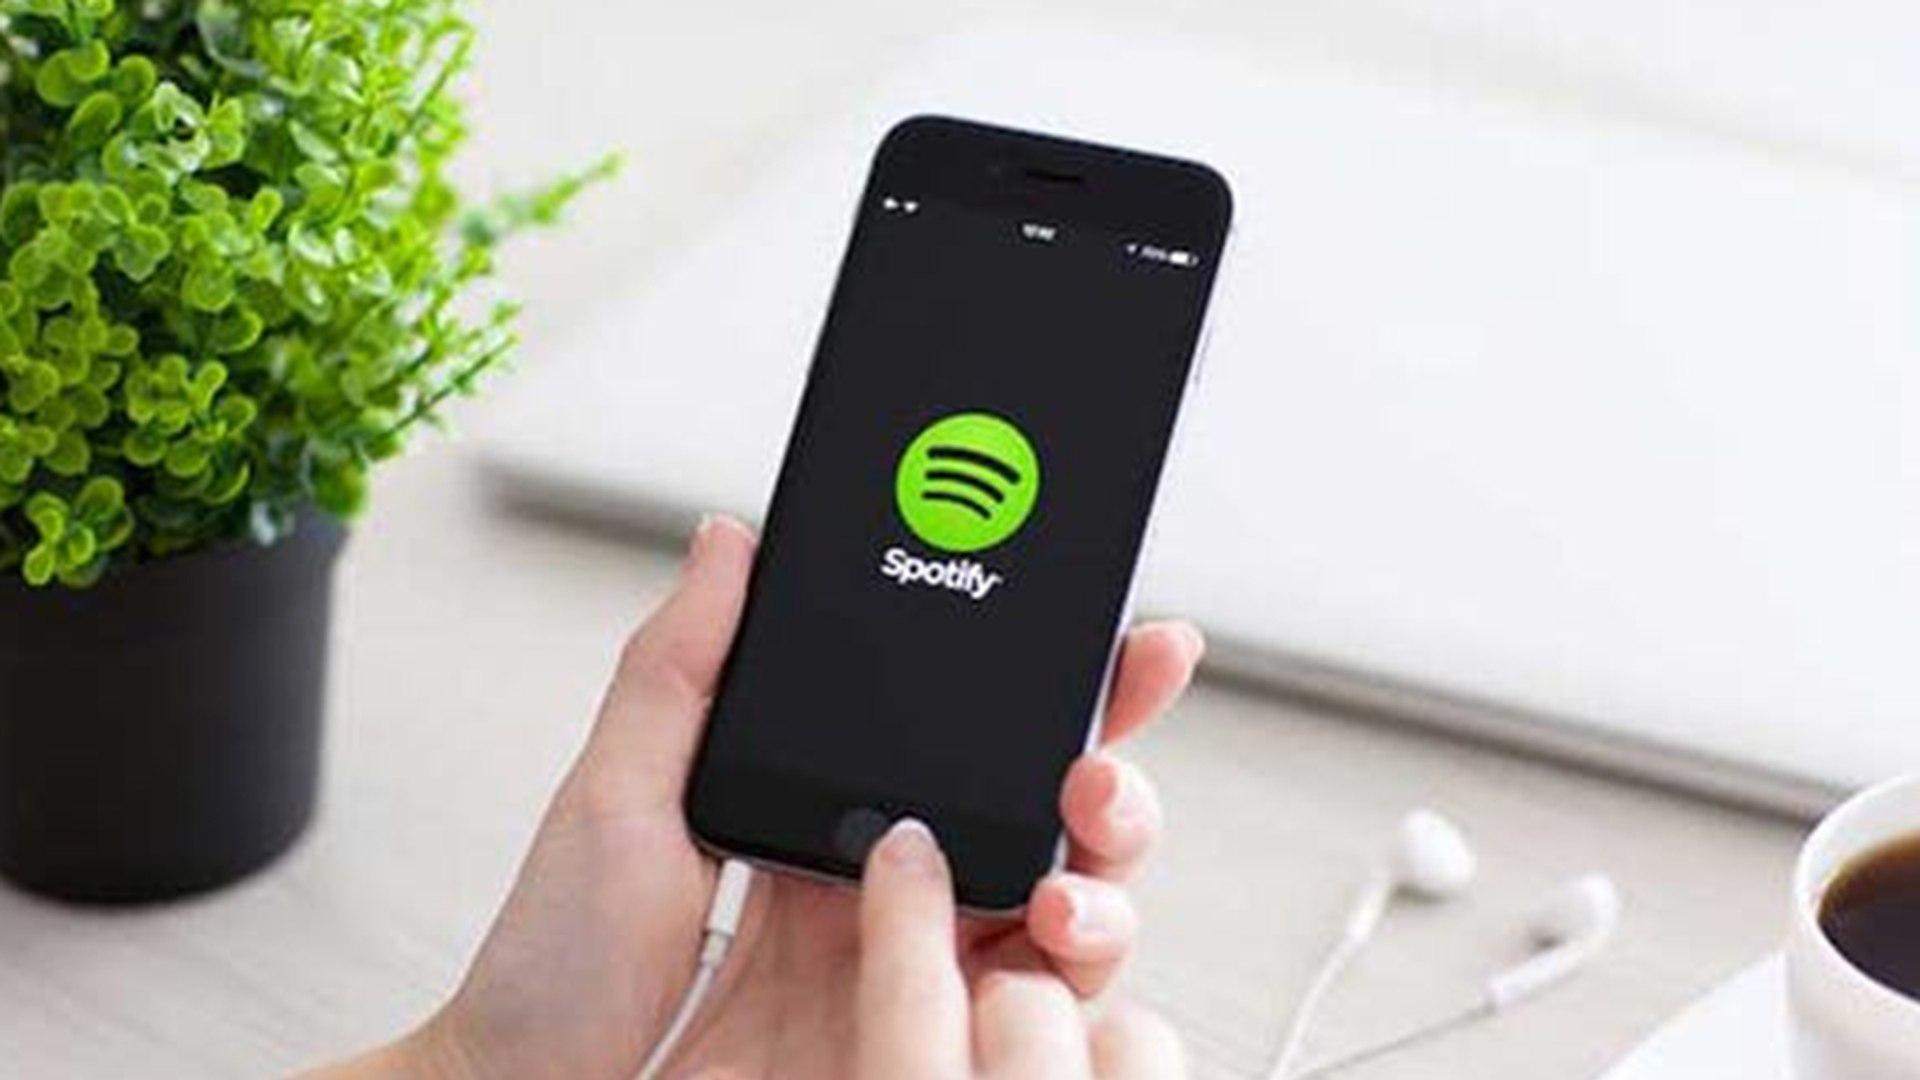 Spotify vs Gaana vs JioSaavn vs Amazon Music